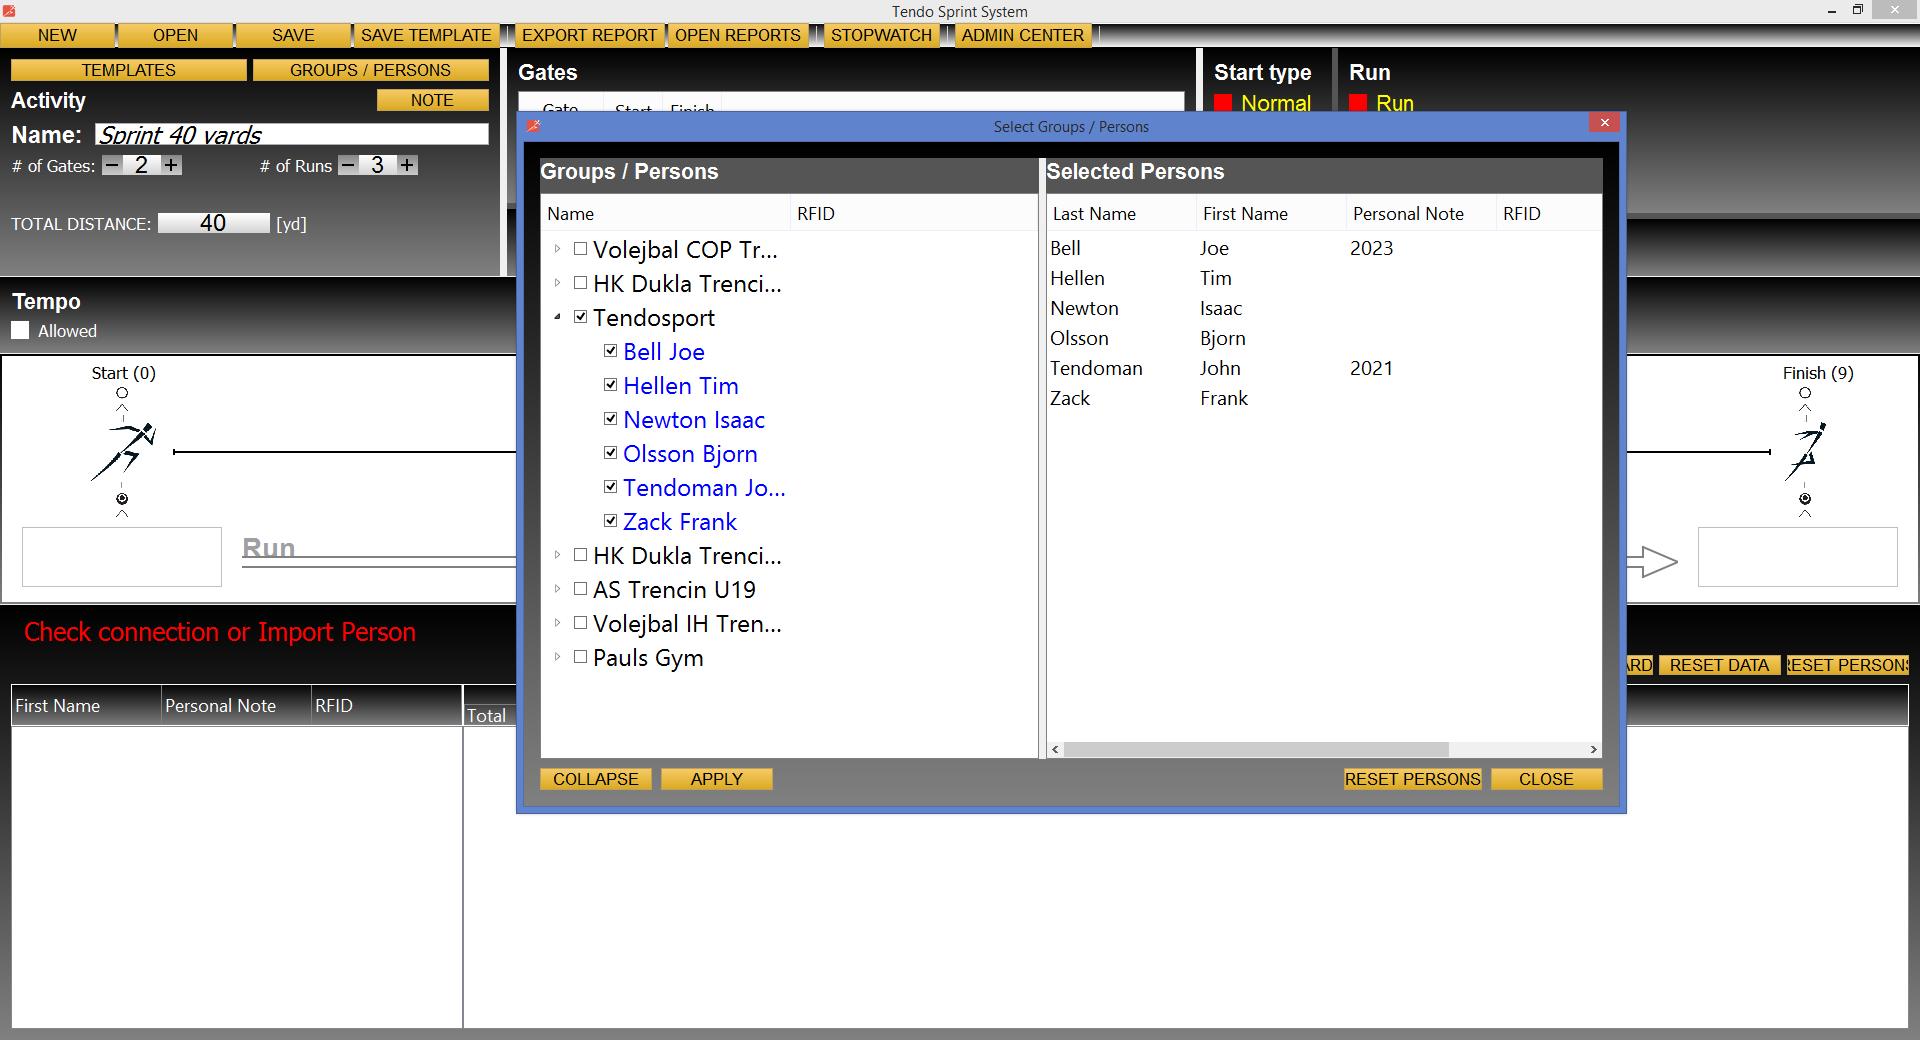 Tendo Sprint System timing system athlete database